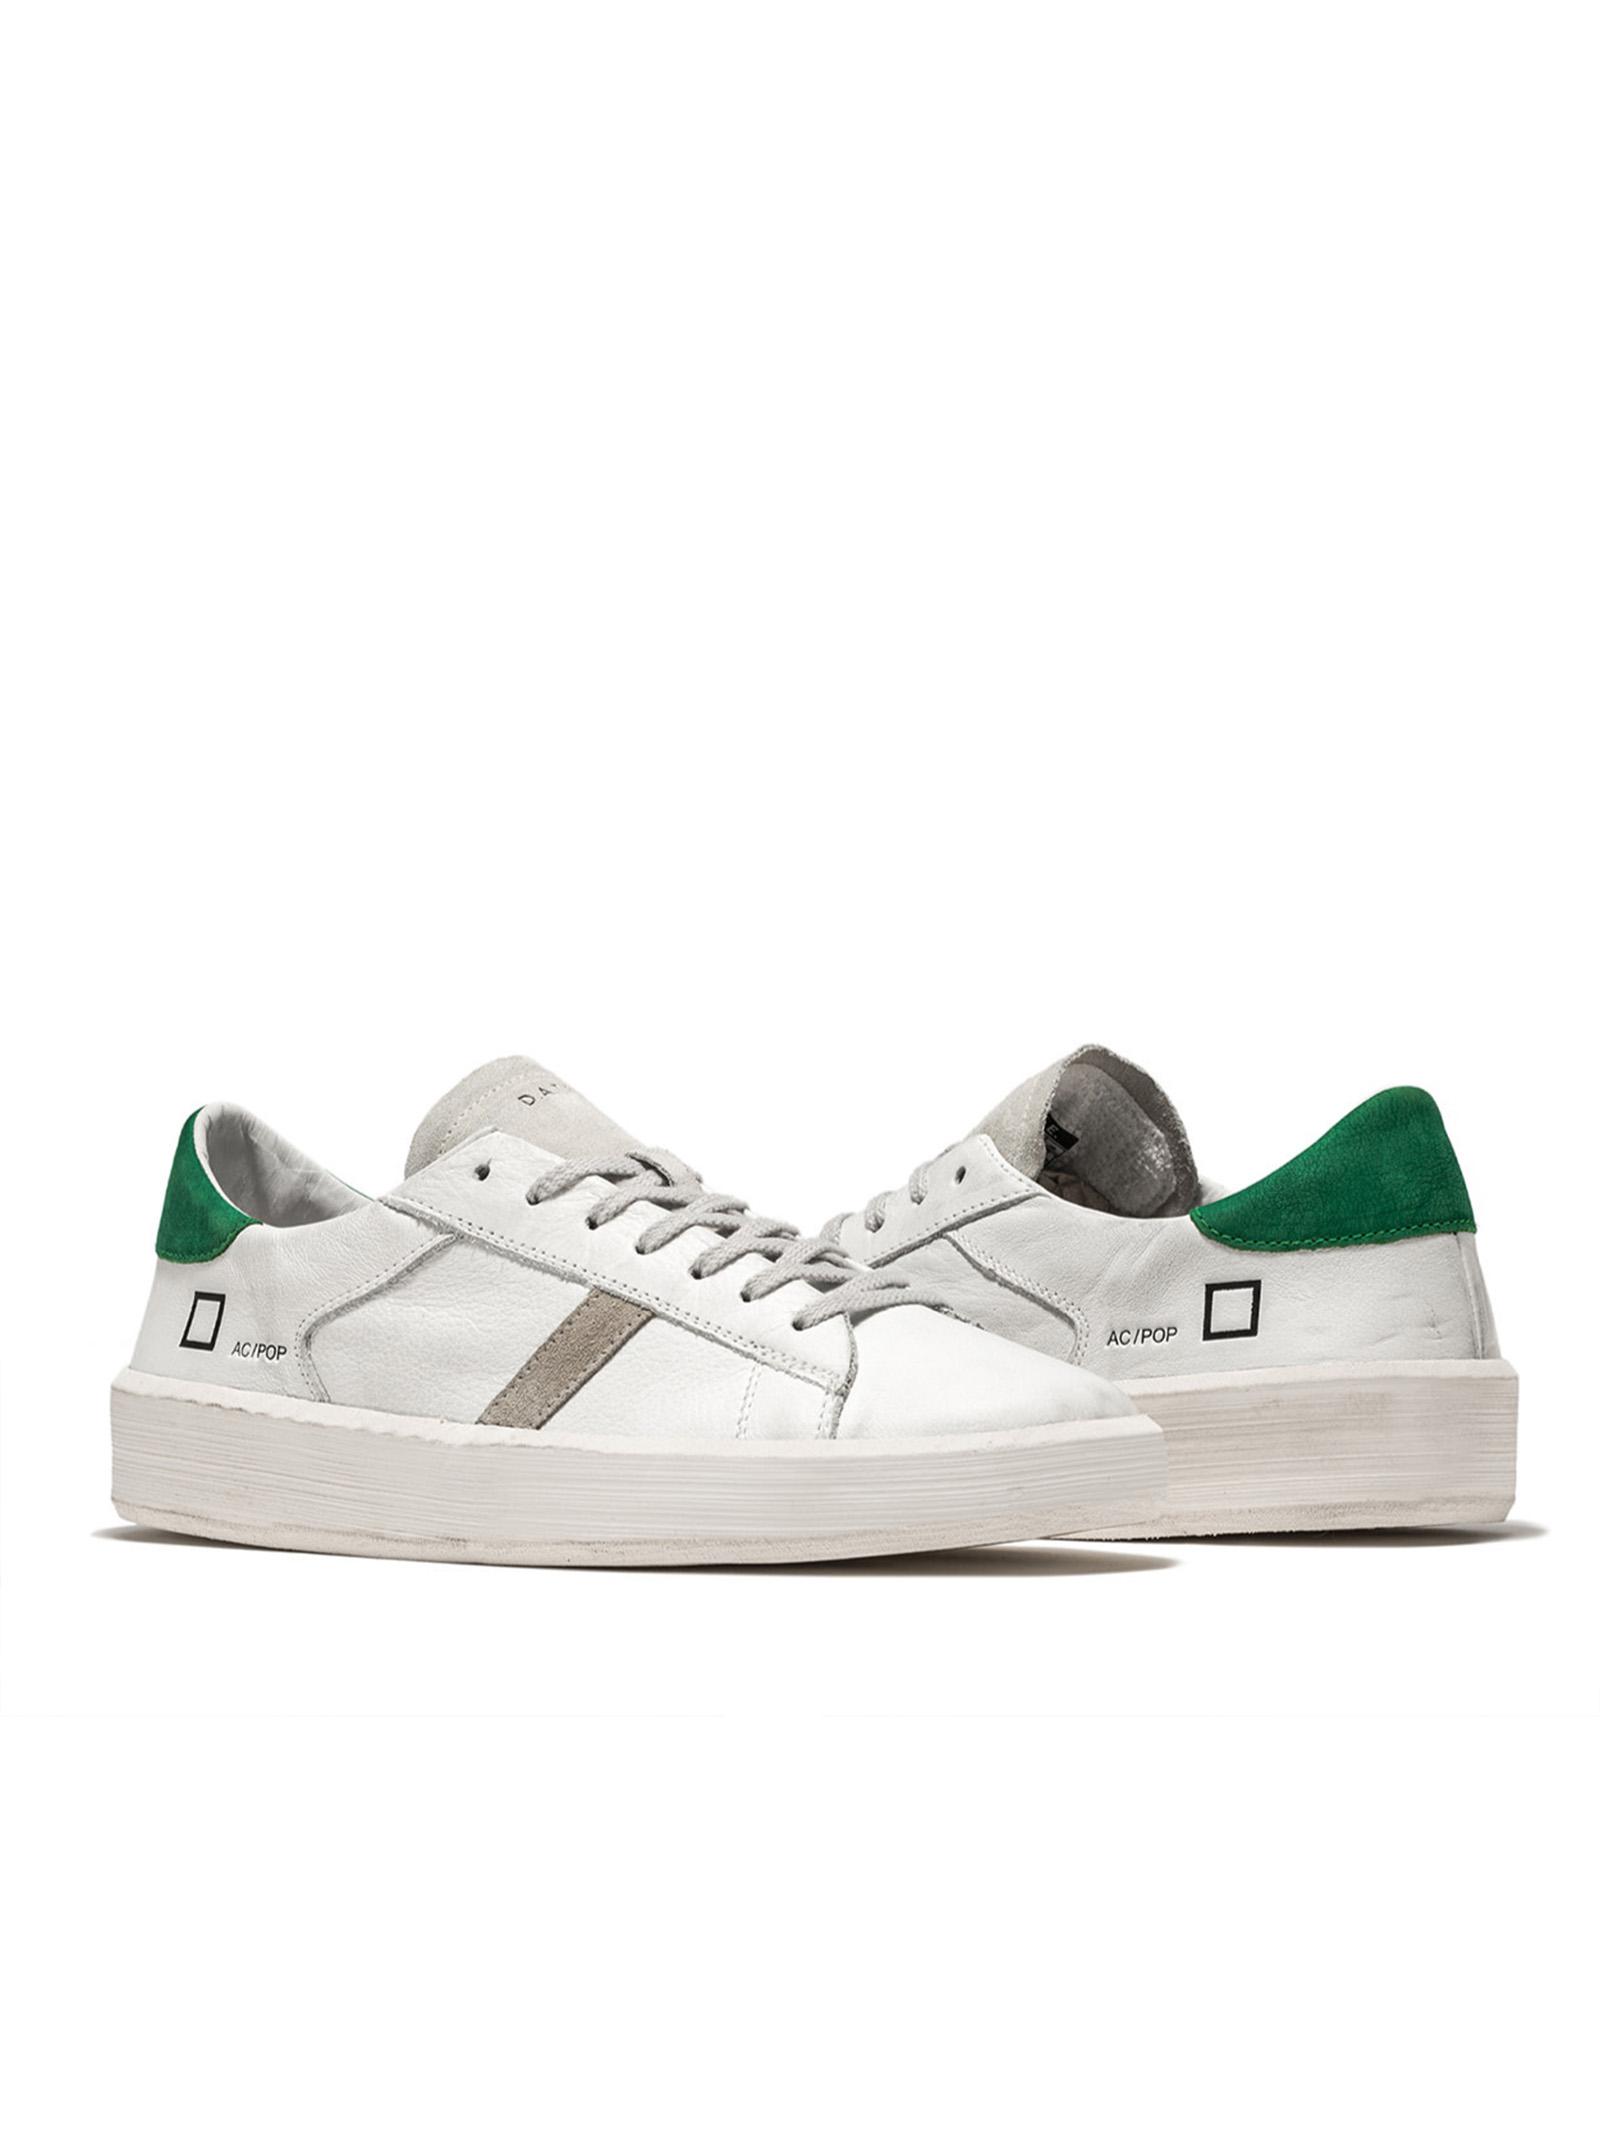 ACE POP WHITE-GREEN D.A.T.E. | Scarpe | M341-AC-POWG